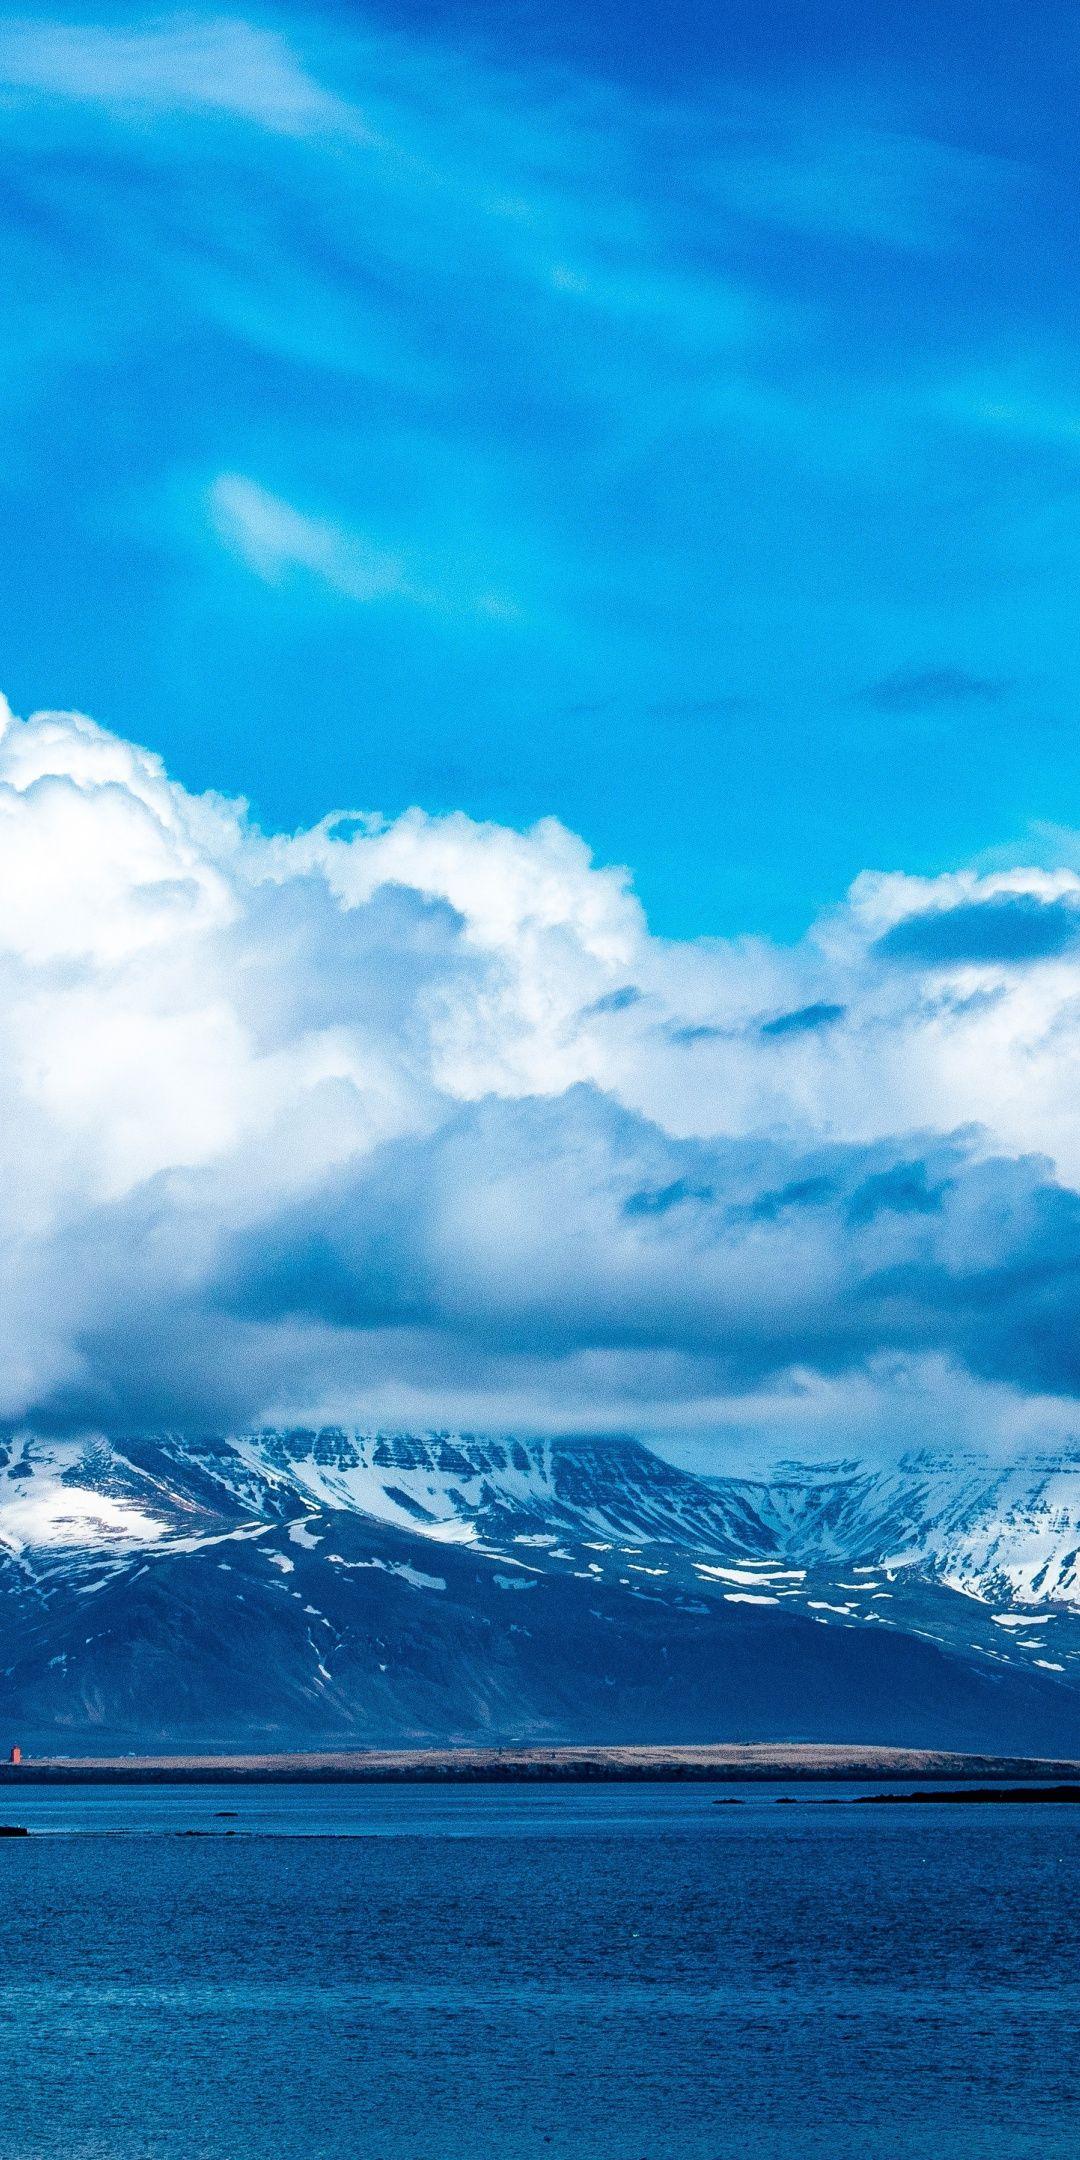 Blue Sky Clouds Mountains Winter Sea Nature 1080x2160 Wallpaper Wallpaper Landscape Clouds Sky